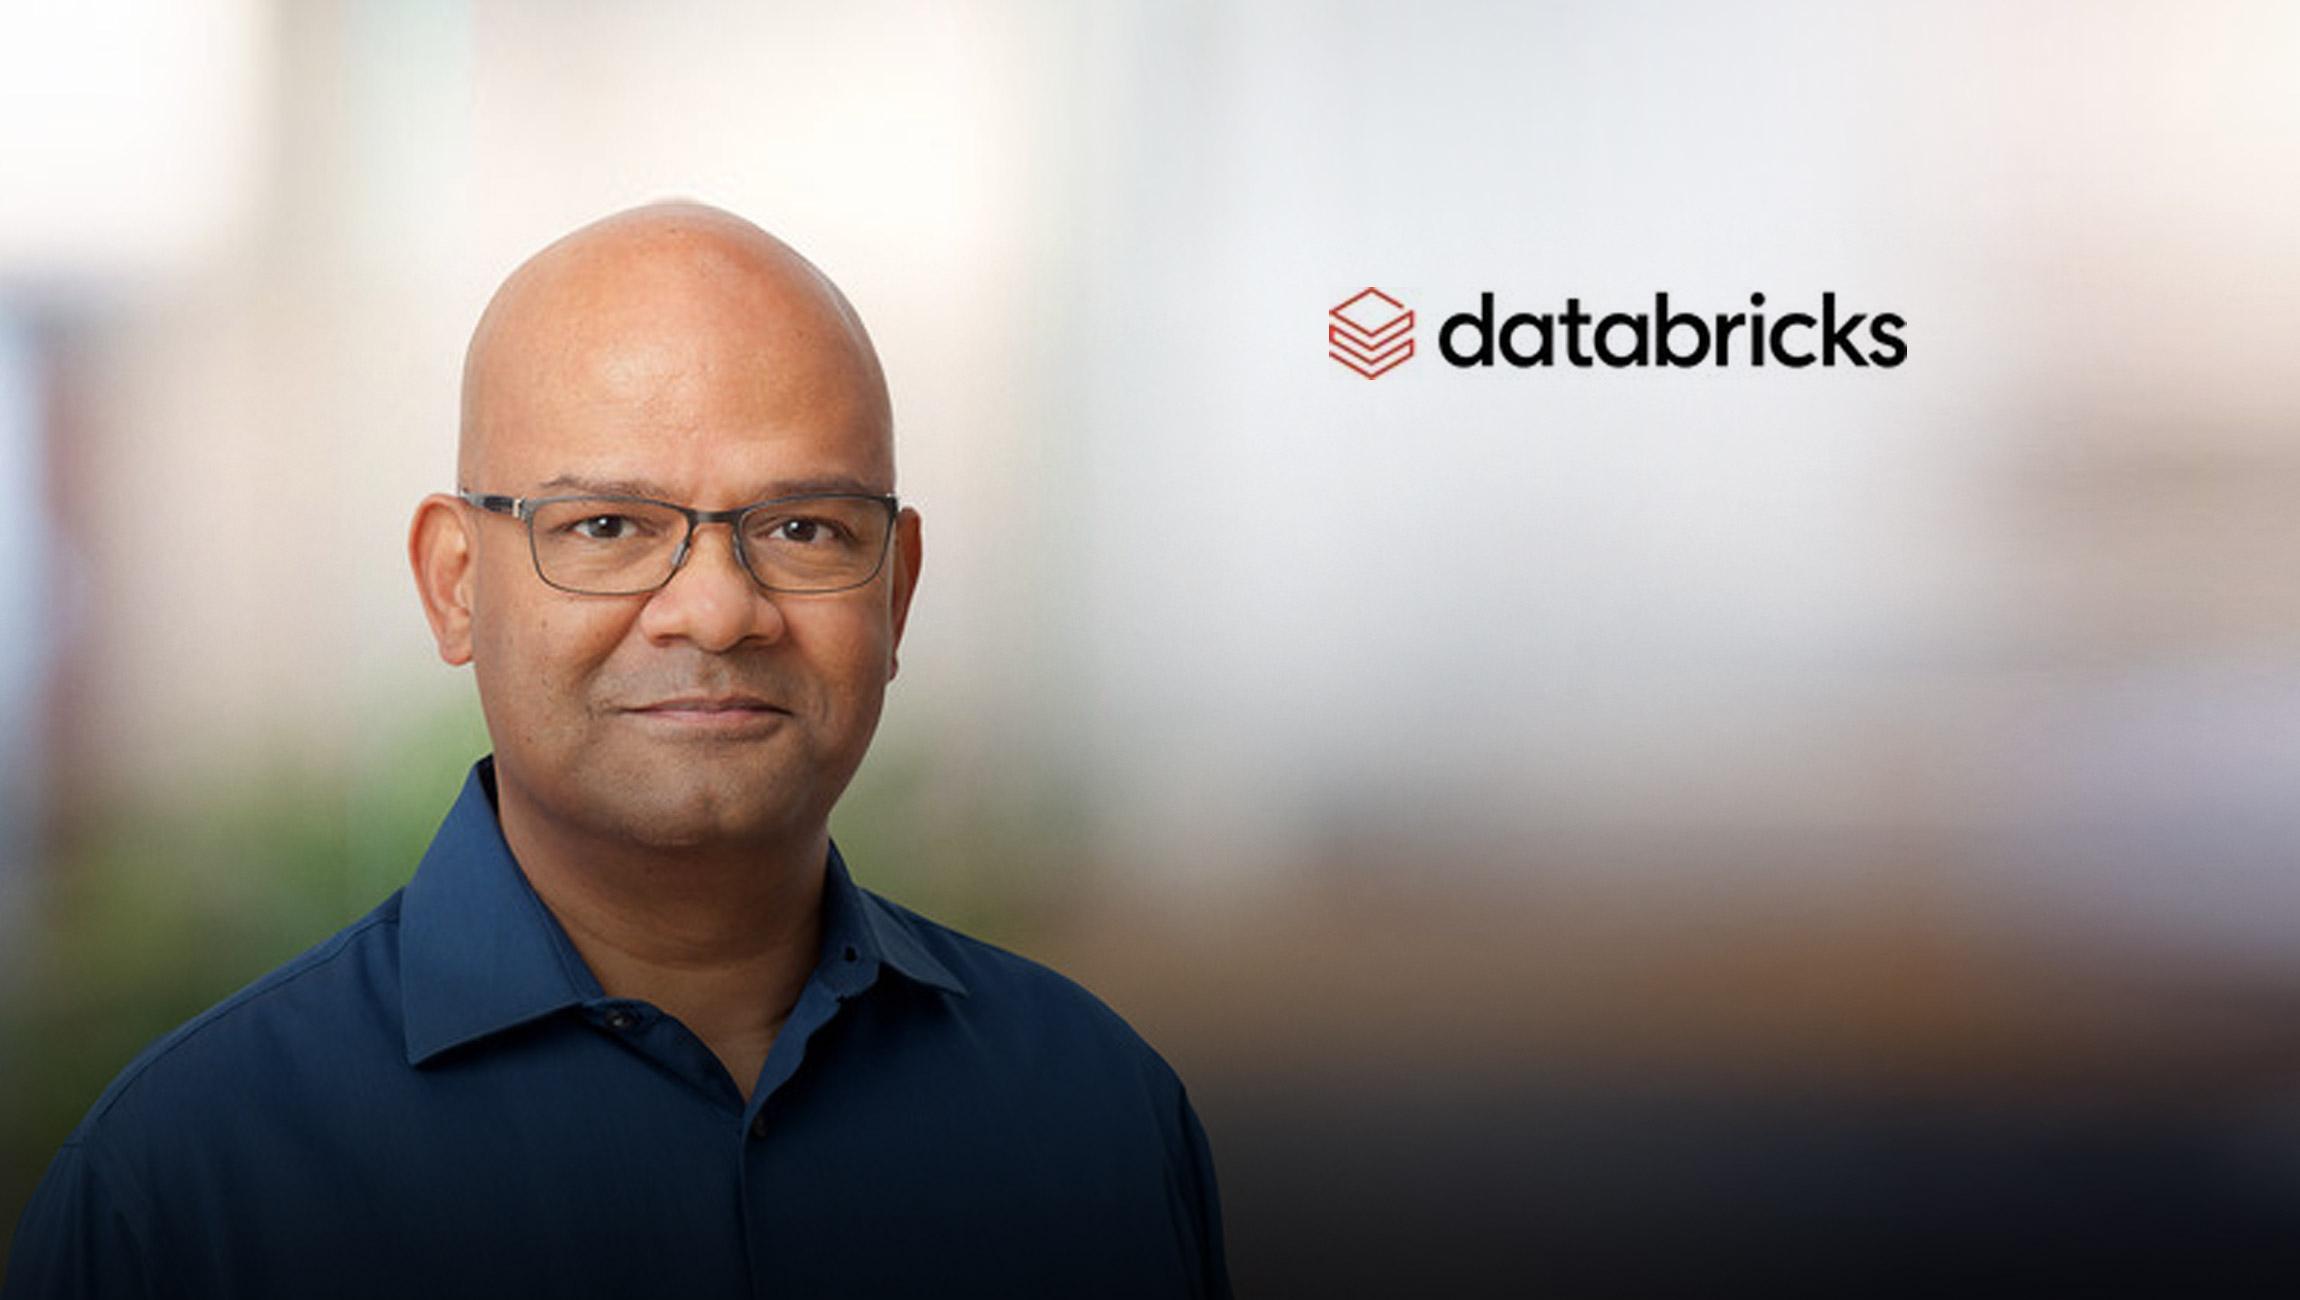 Databricks Appoints Vinod Marur as Senior Vice President of Engineering